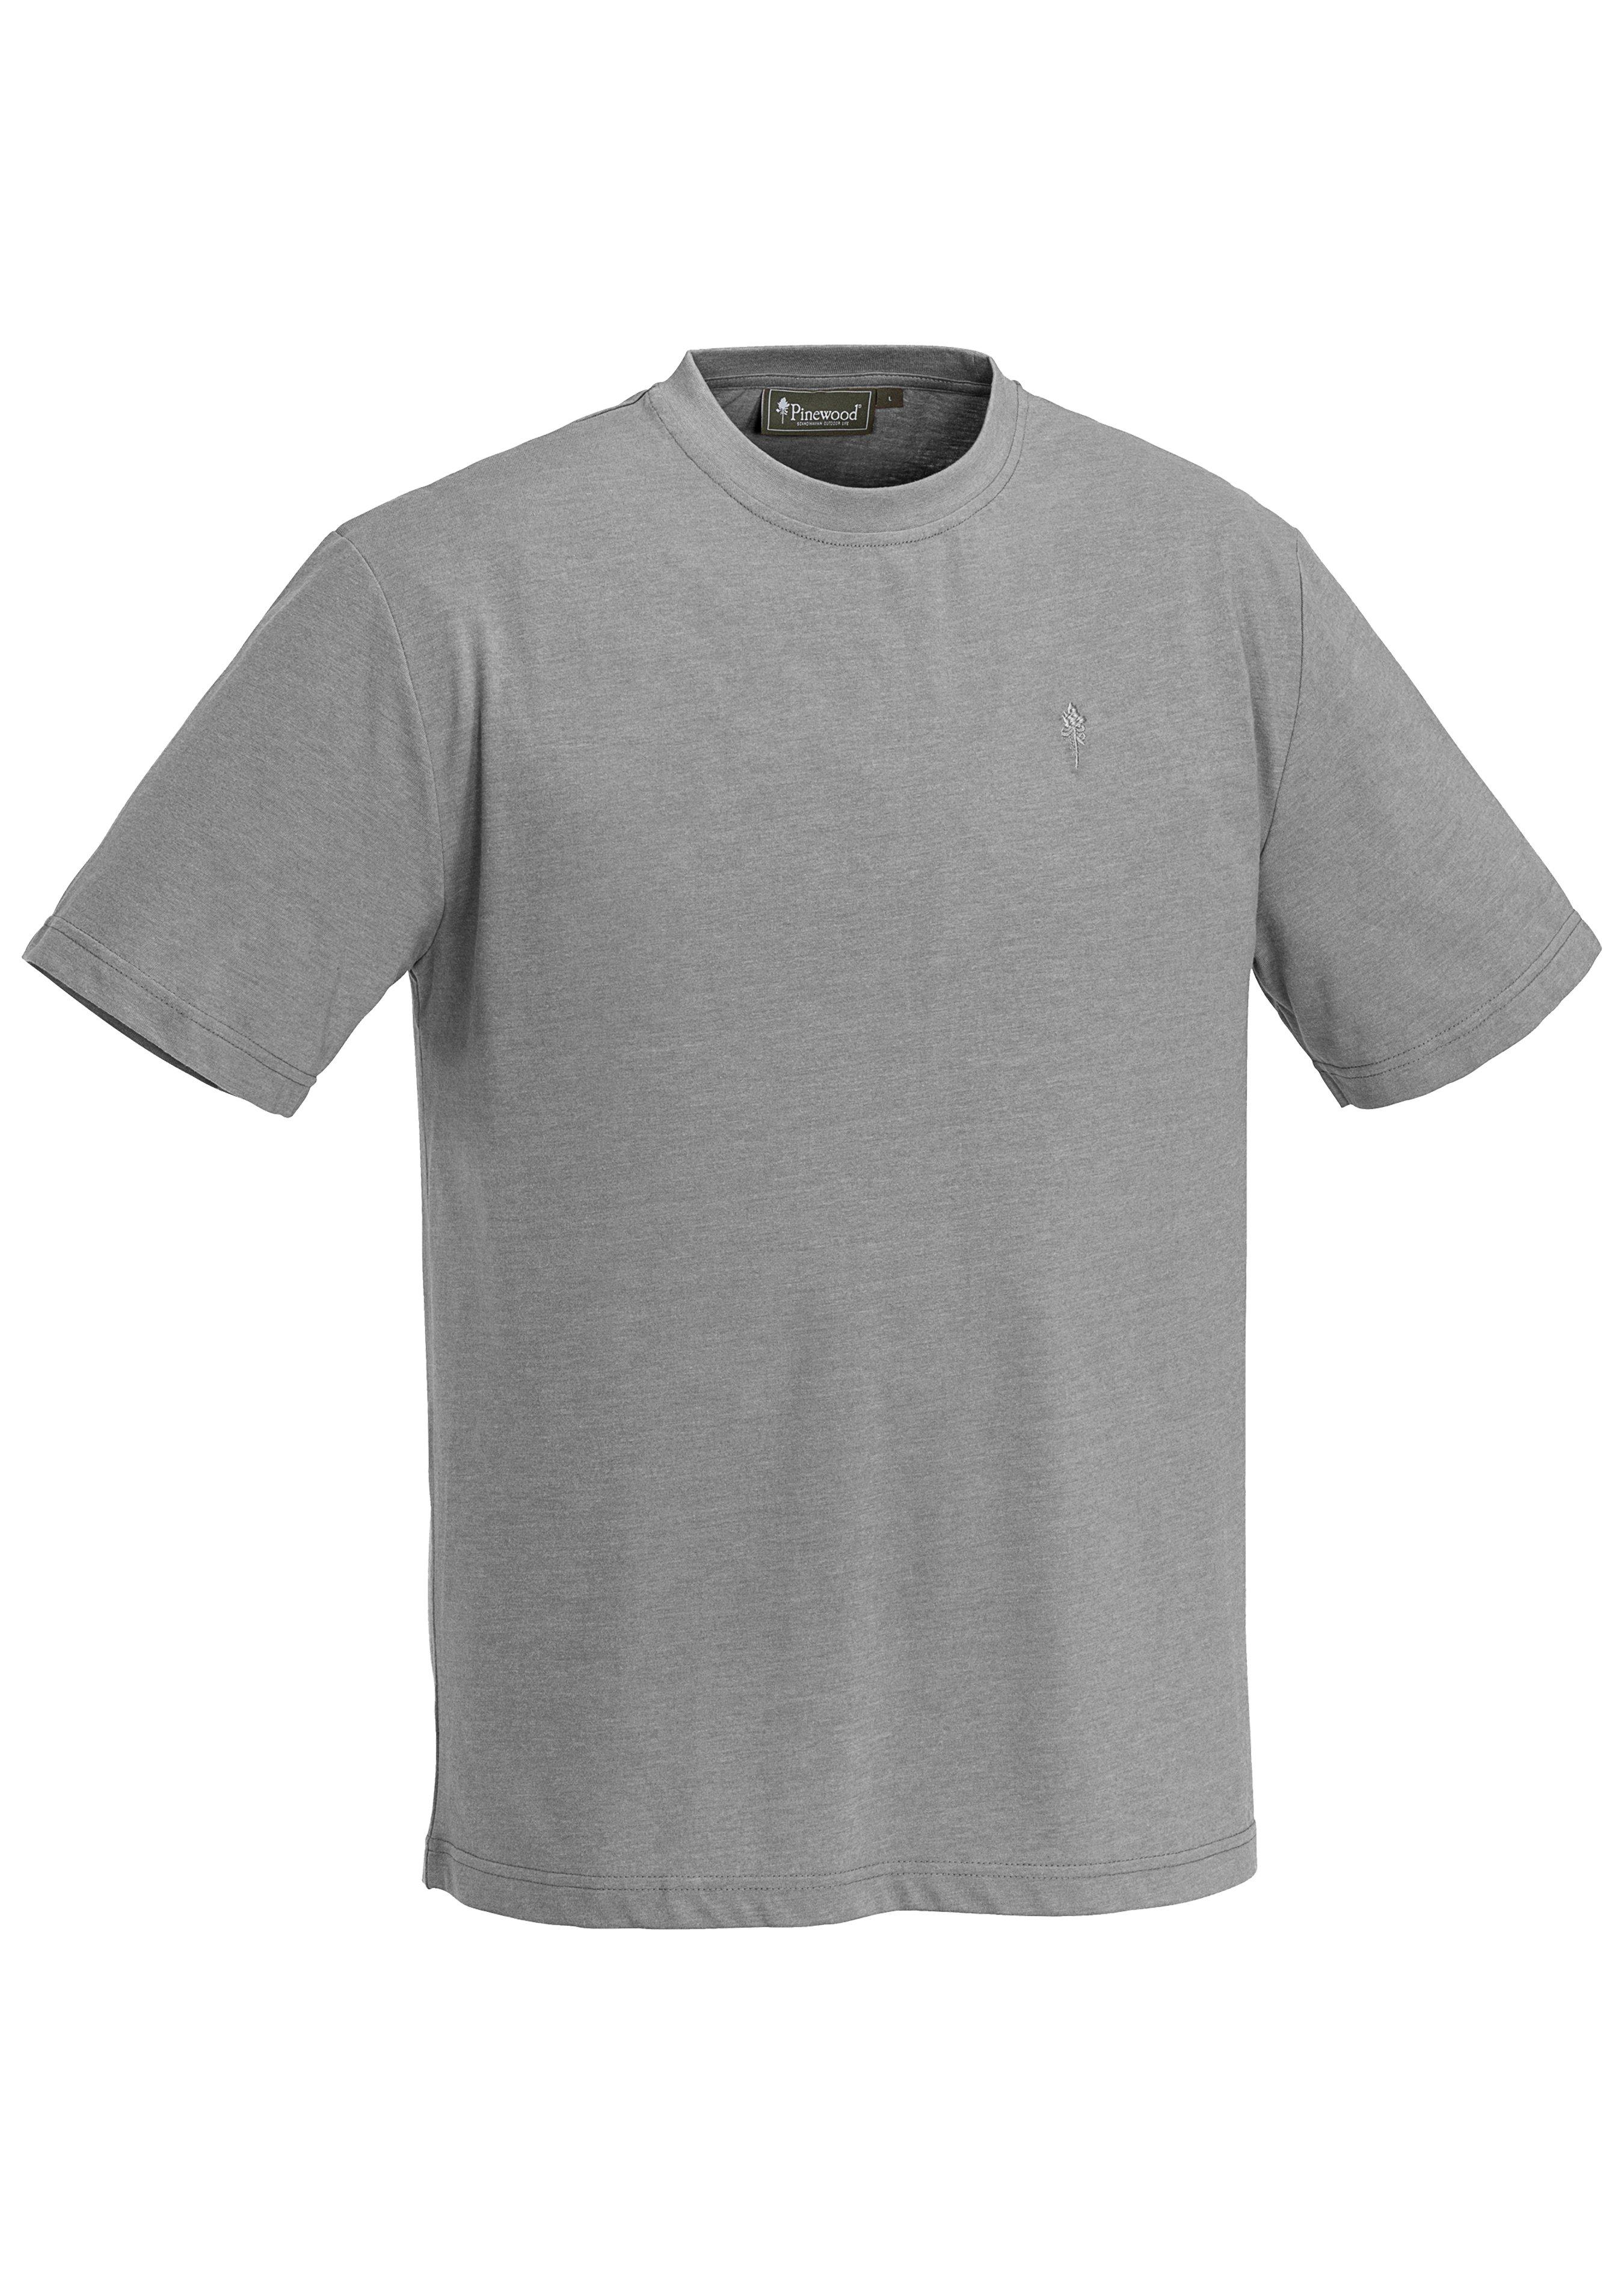 Pinewood T-Shirt im 3er-Pack 250901L 3